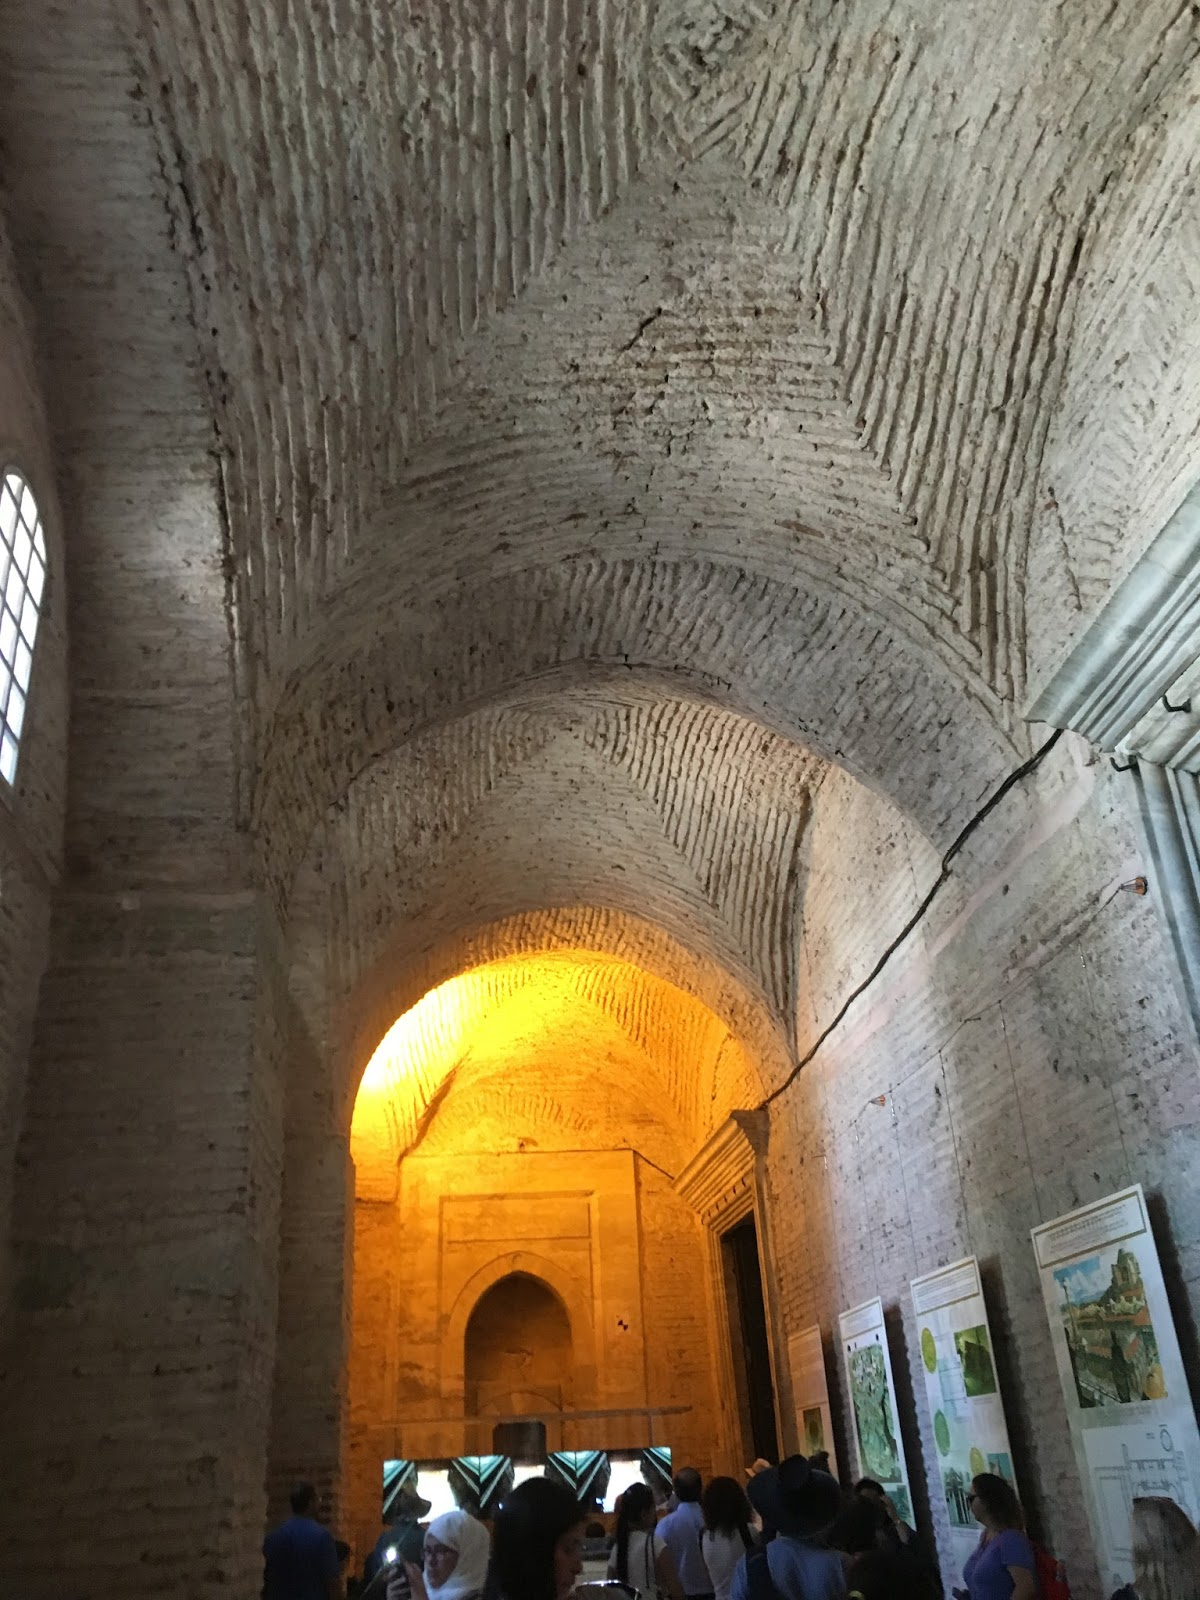 Studia Croatica: 05 Estambul - Hagia Sophia